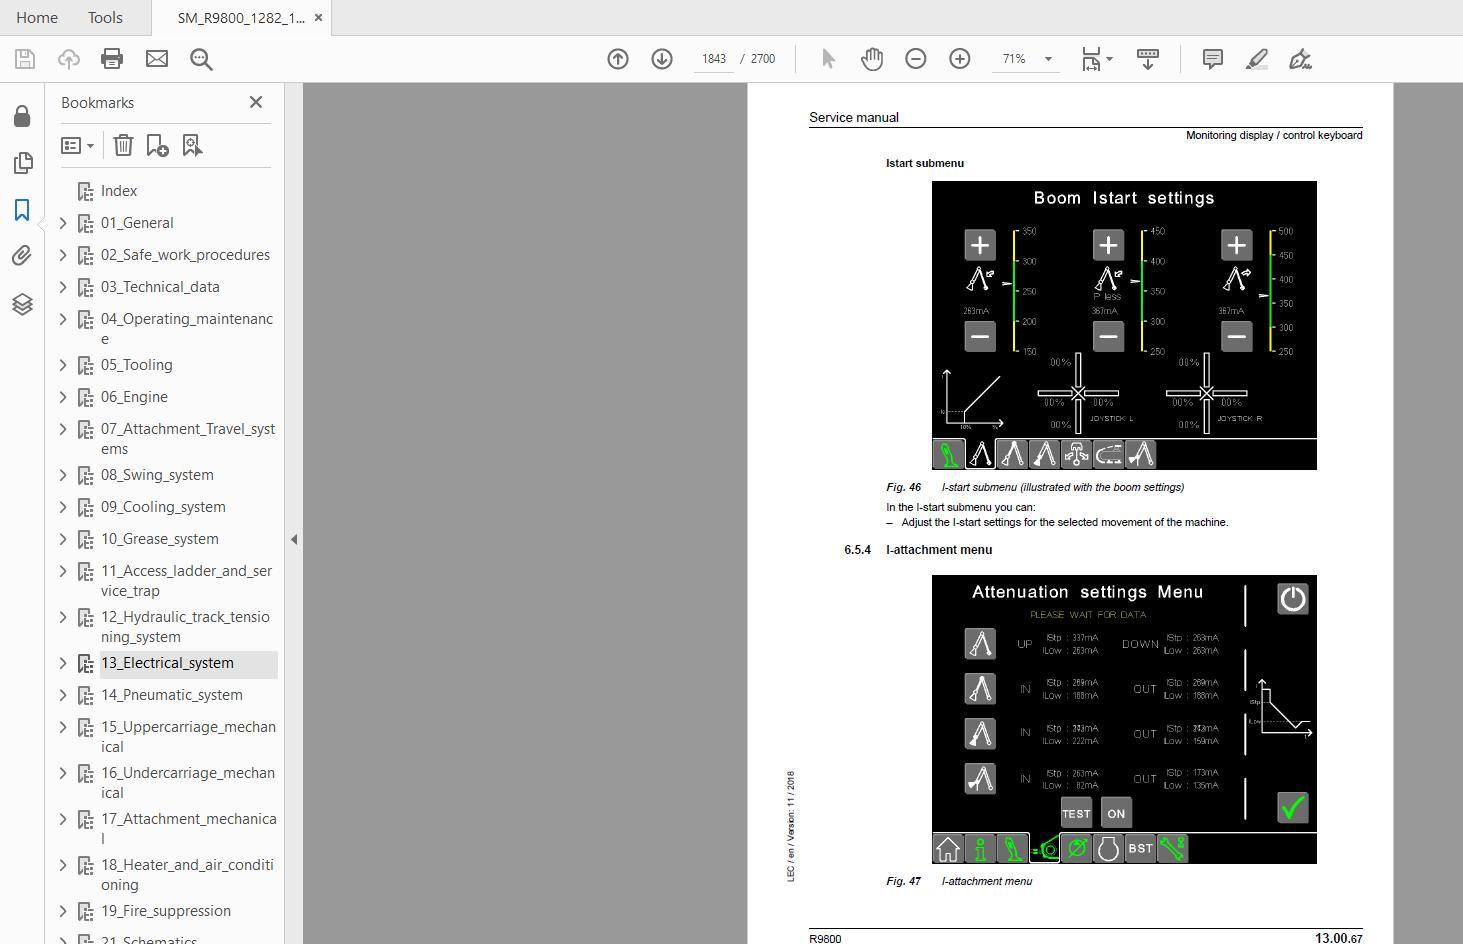 Liebherr_Mining_Excavators_Service_Manual_New_Updated_032020_12